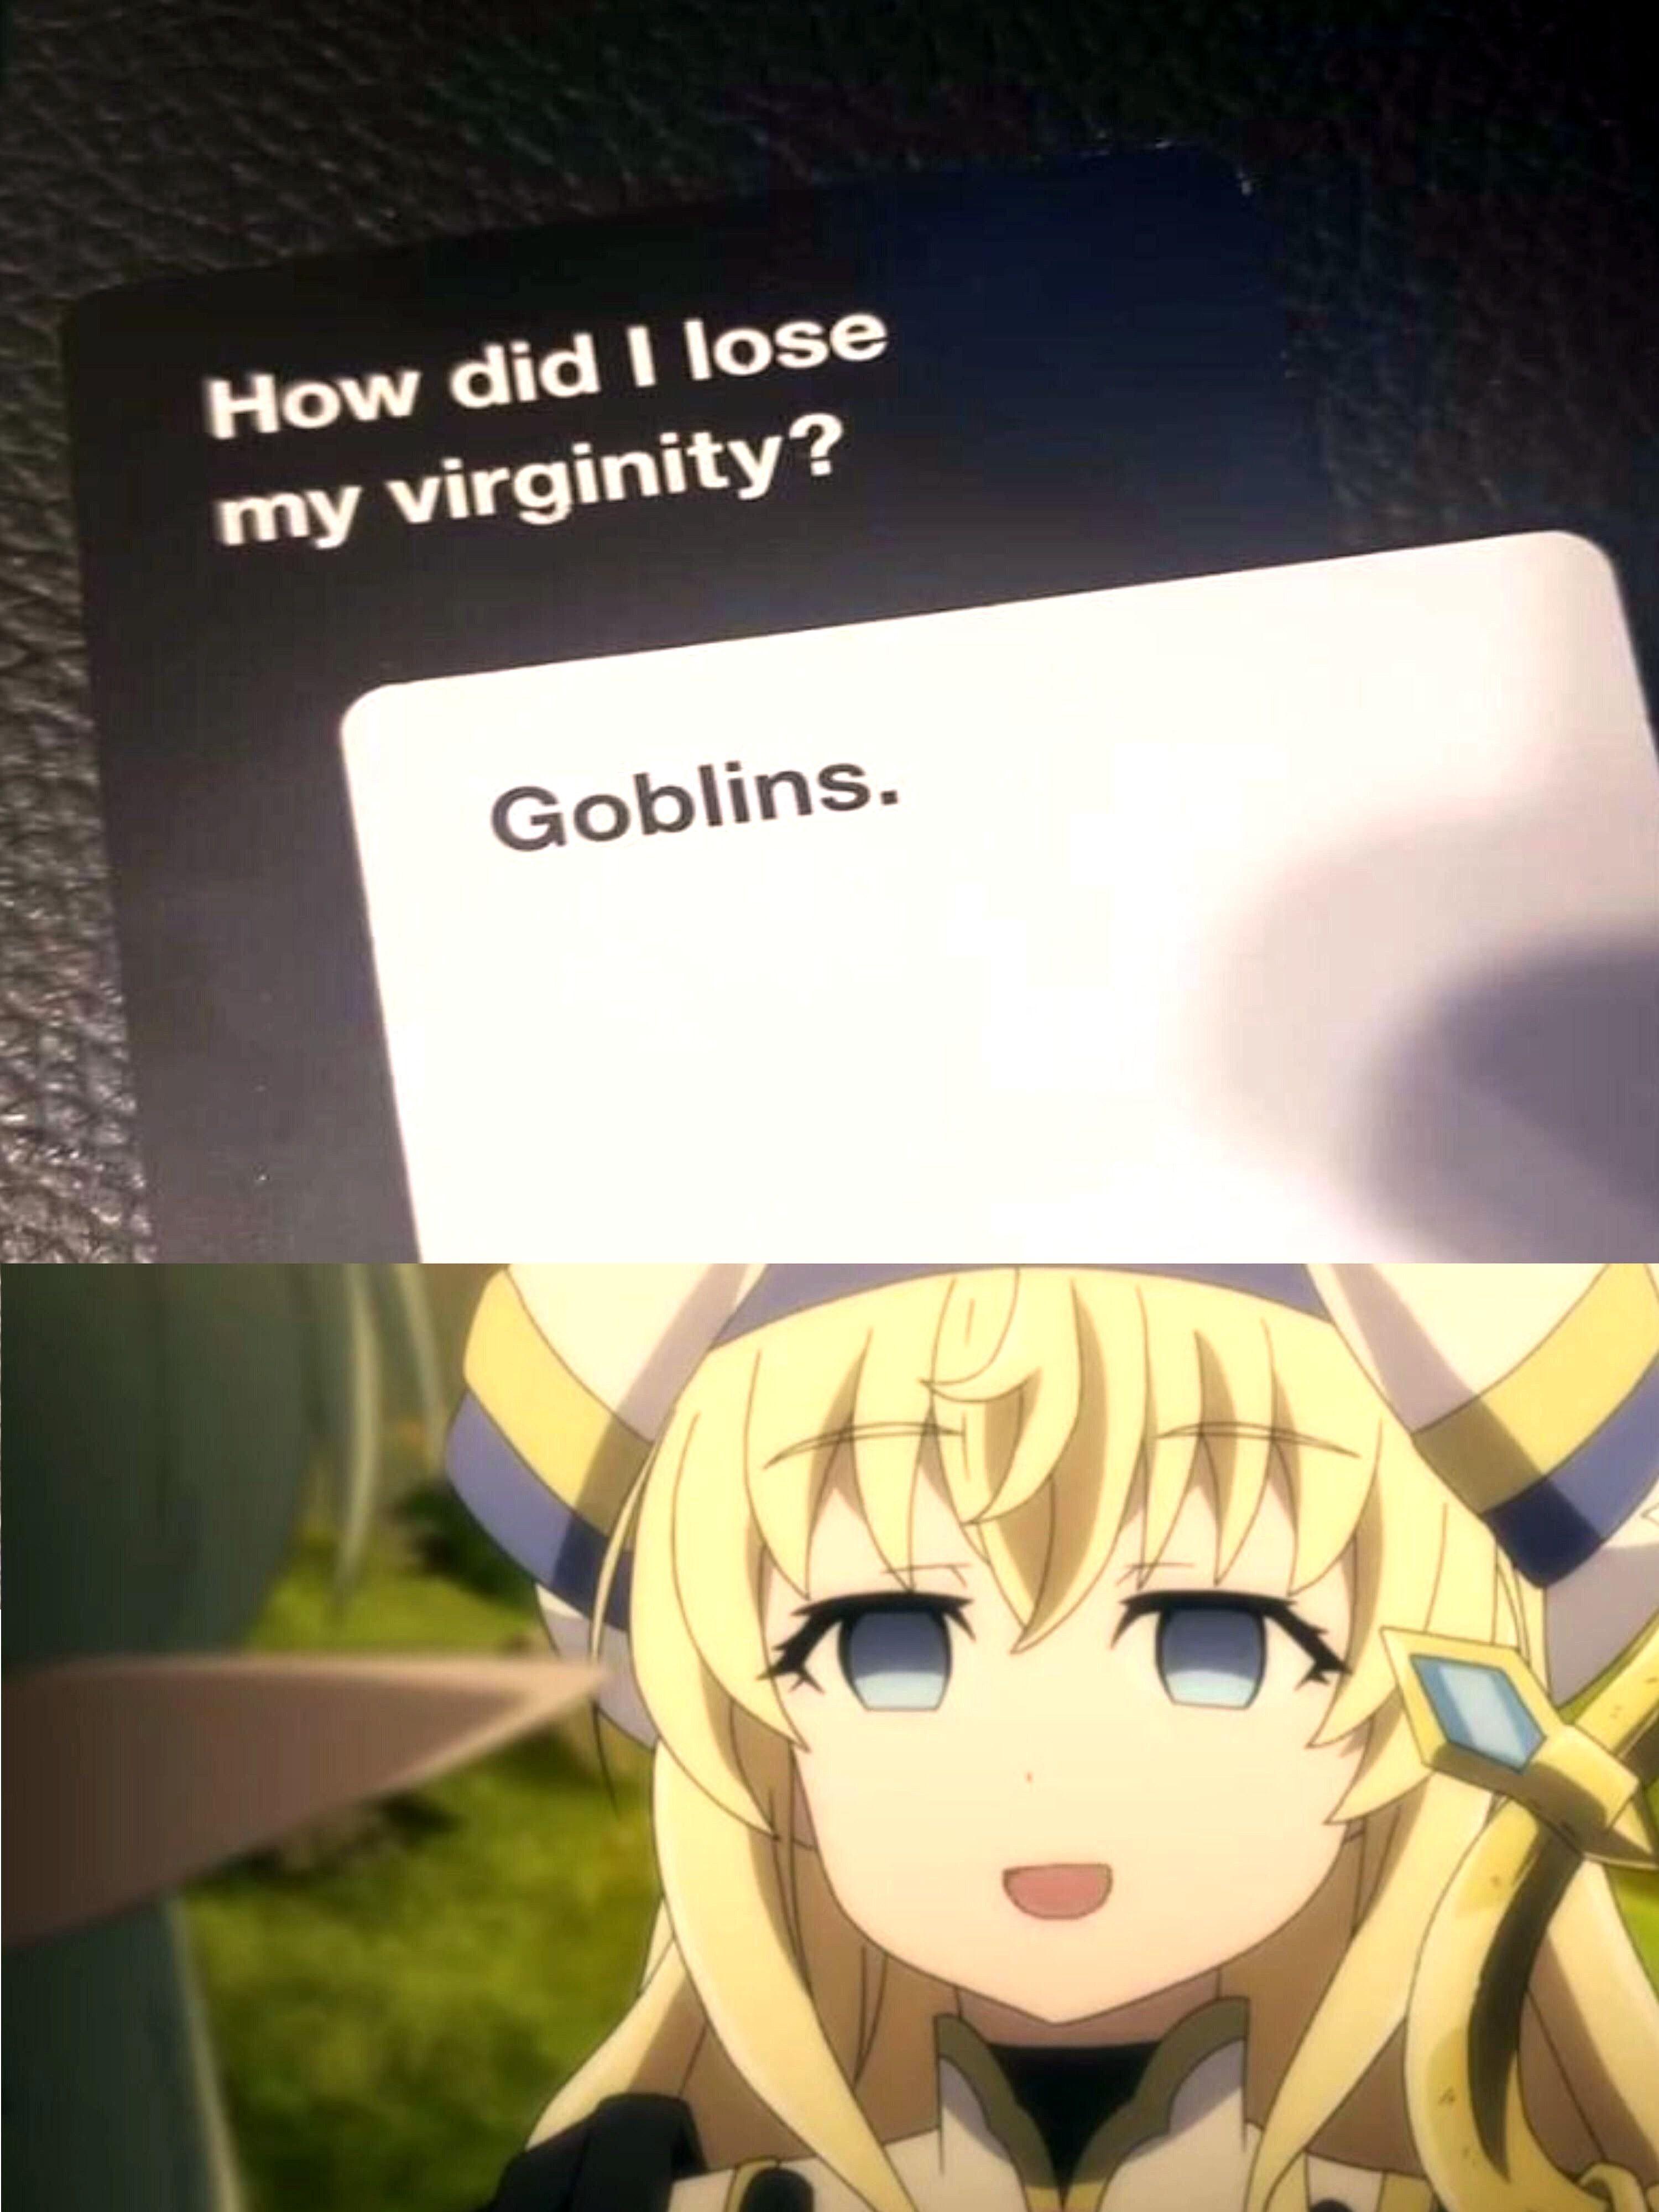 Bahahahahaha These Anime Memes Are Insane Anime Memes Song In 2020 Anime Memes Anime Funny Anime